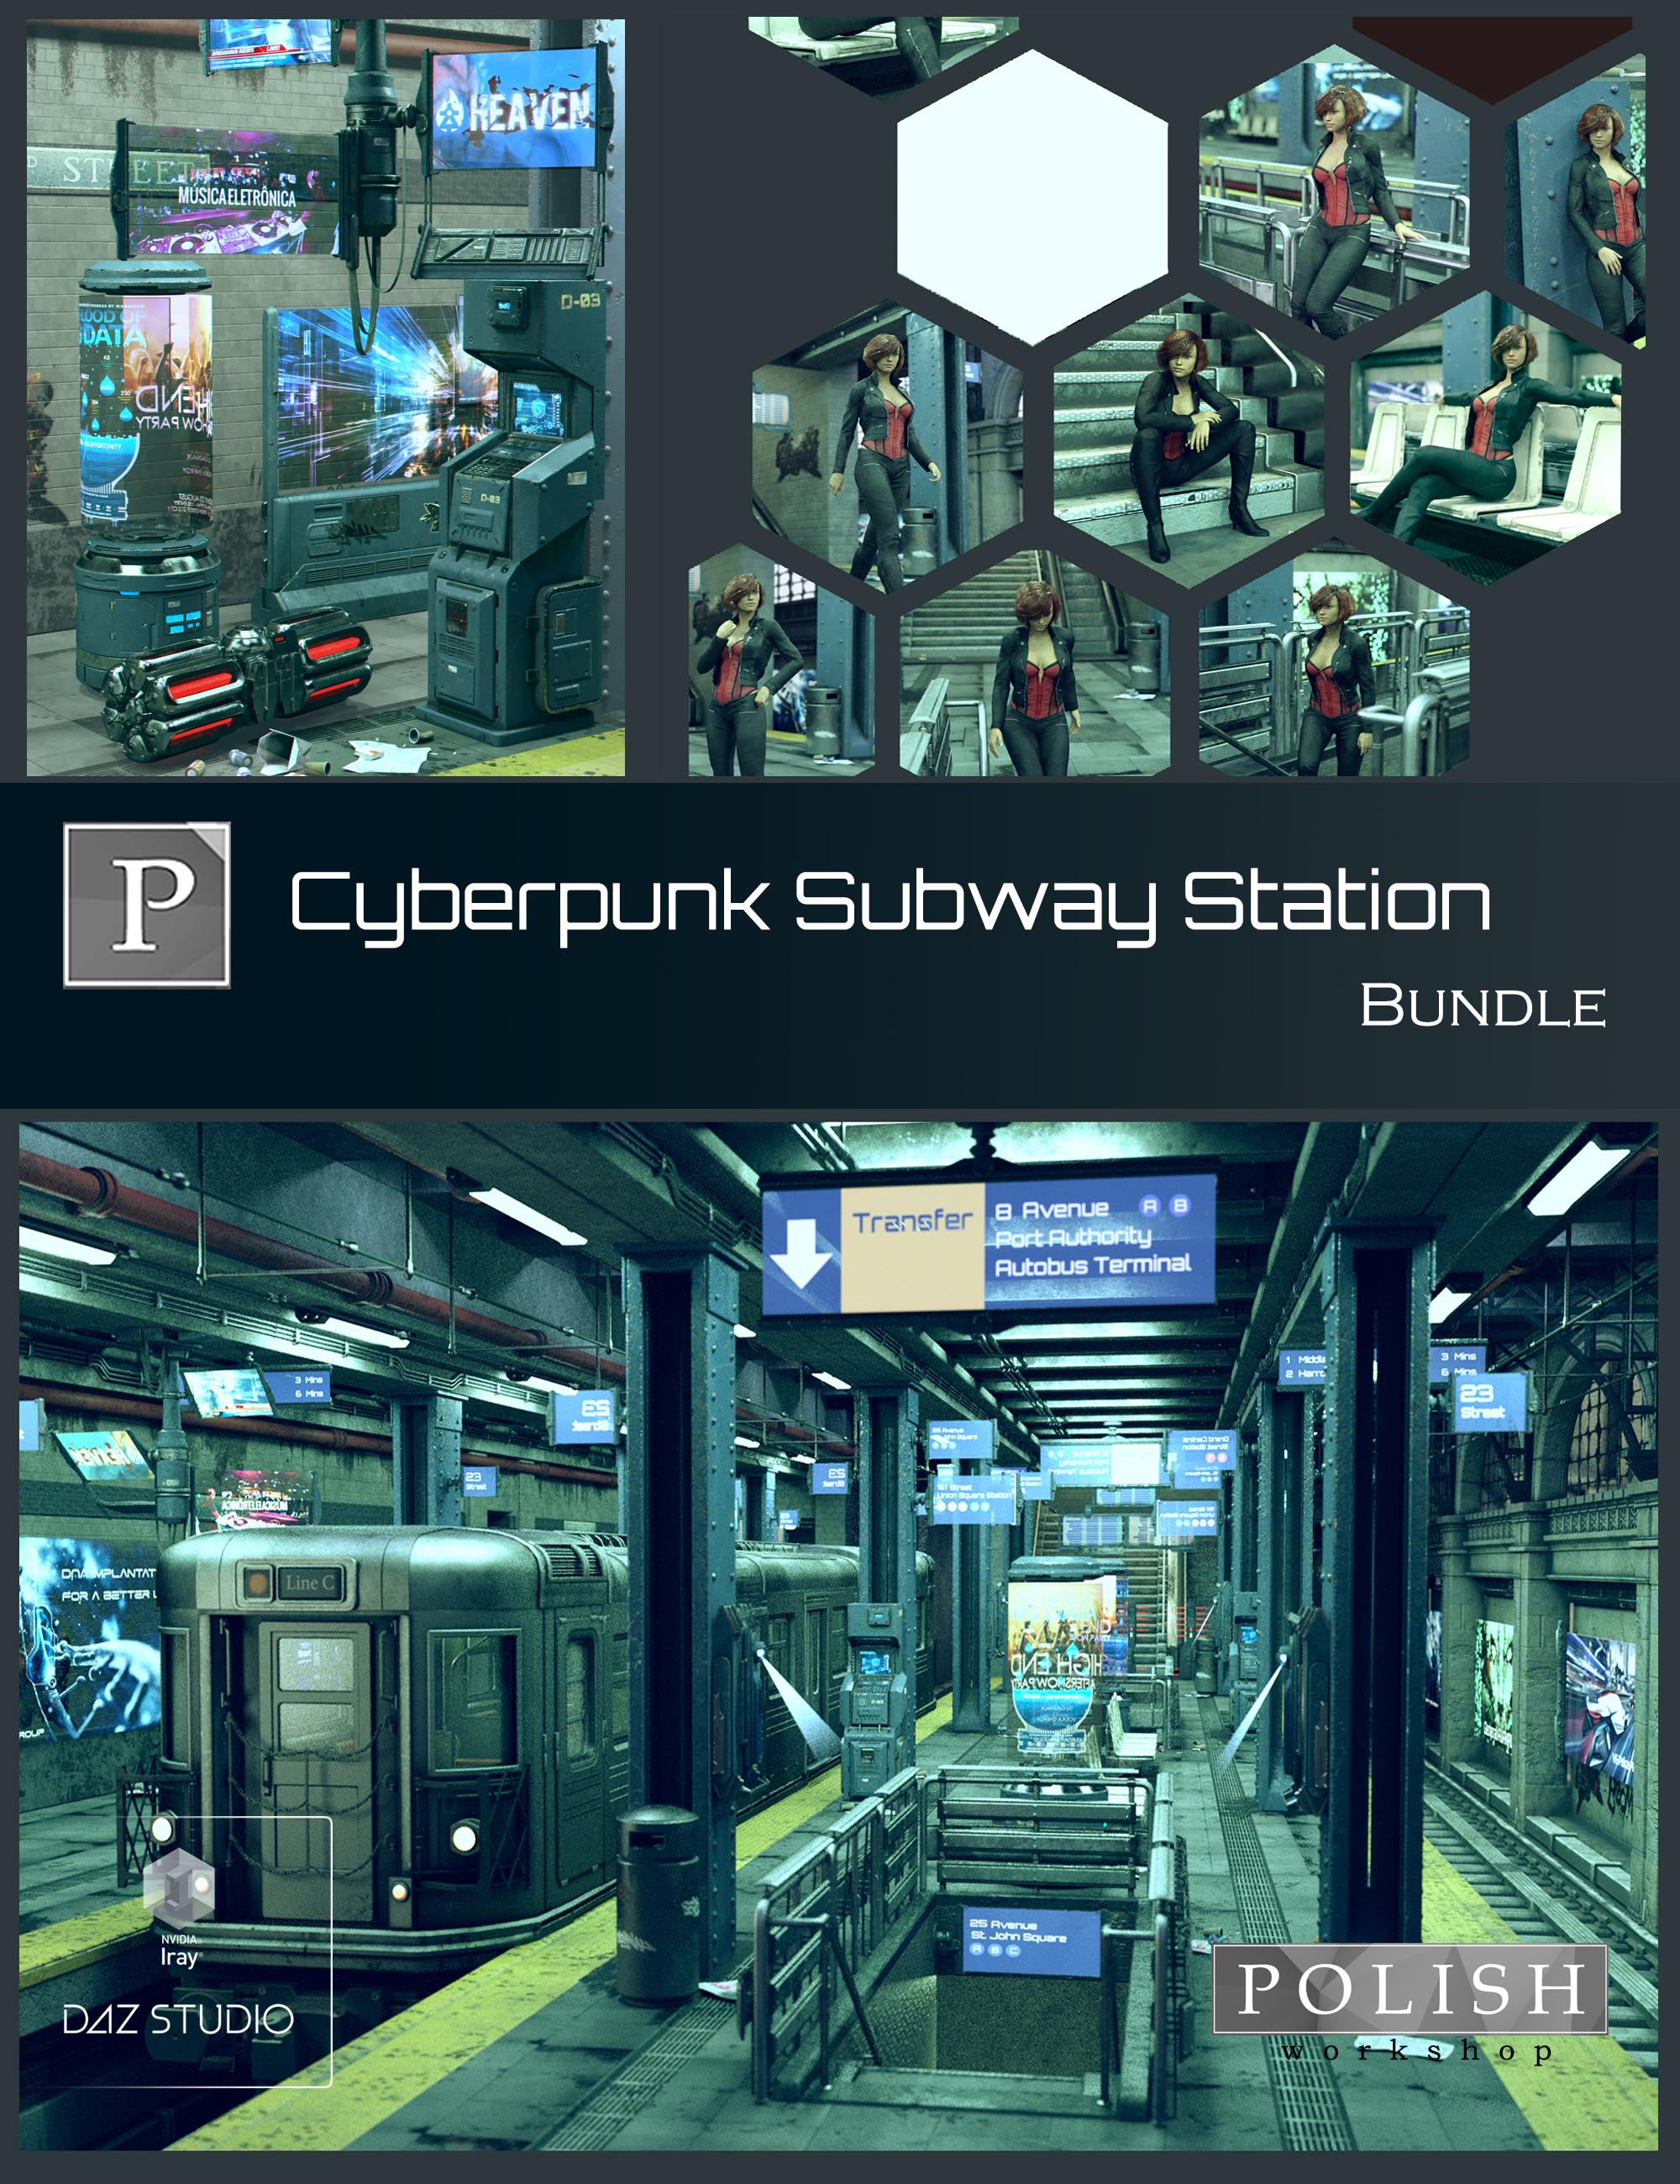 Cyberpunk Subway Station Bundle by: Polish, 3D Models by Daz 3D